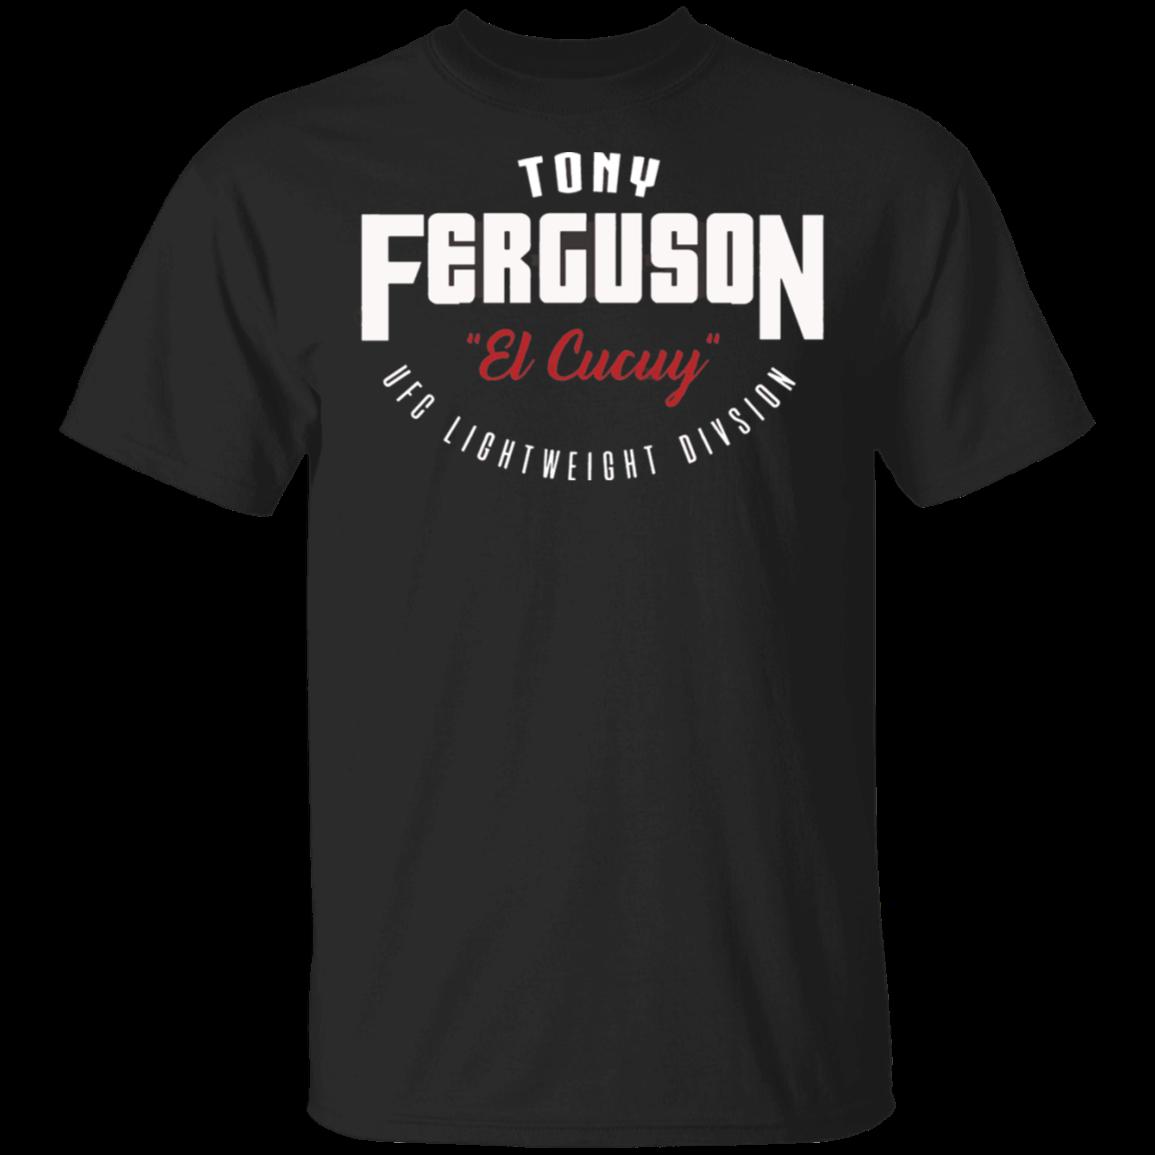 Tony Ferguson Team El Cucuy 2020 Black T Shirt Men Women M-XXXL Tee Shirt Classic Custom Design